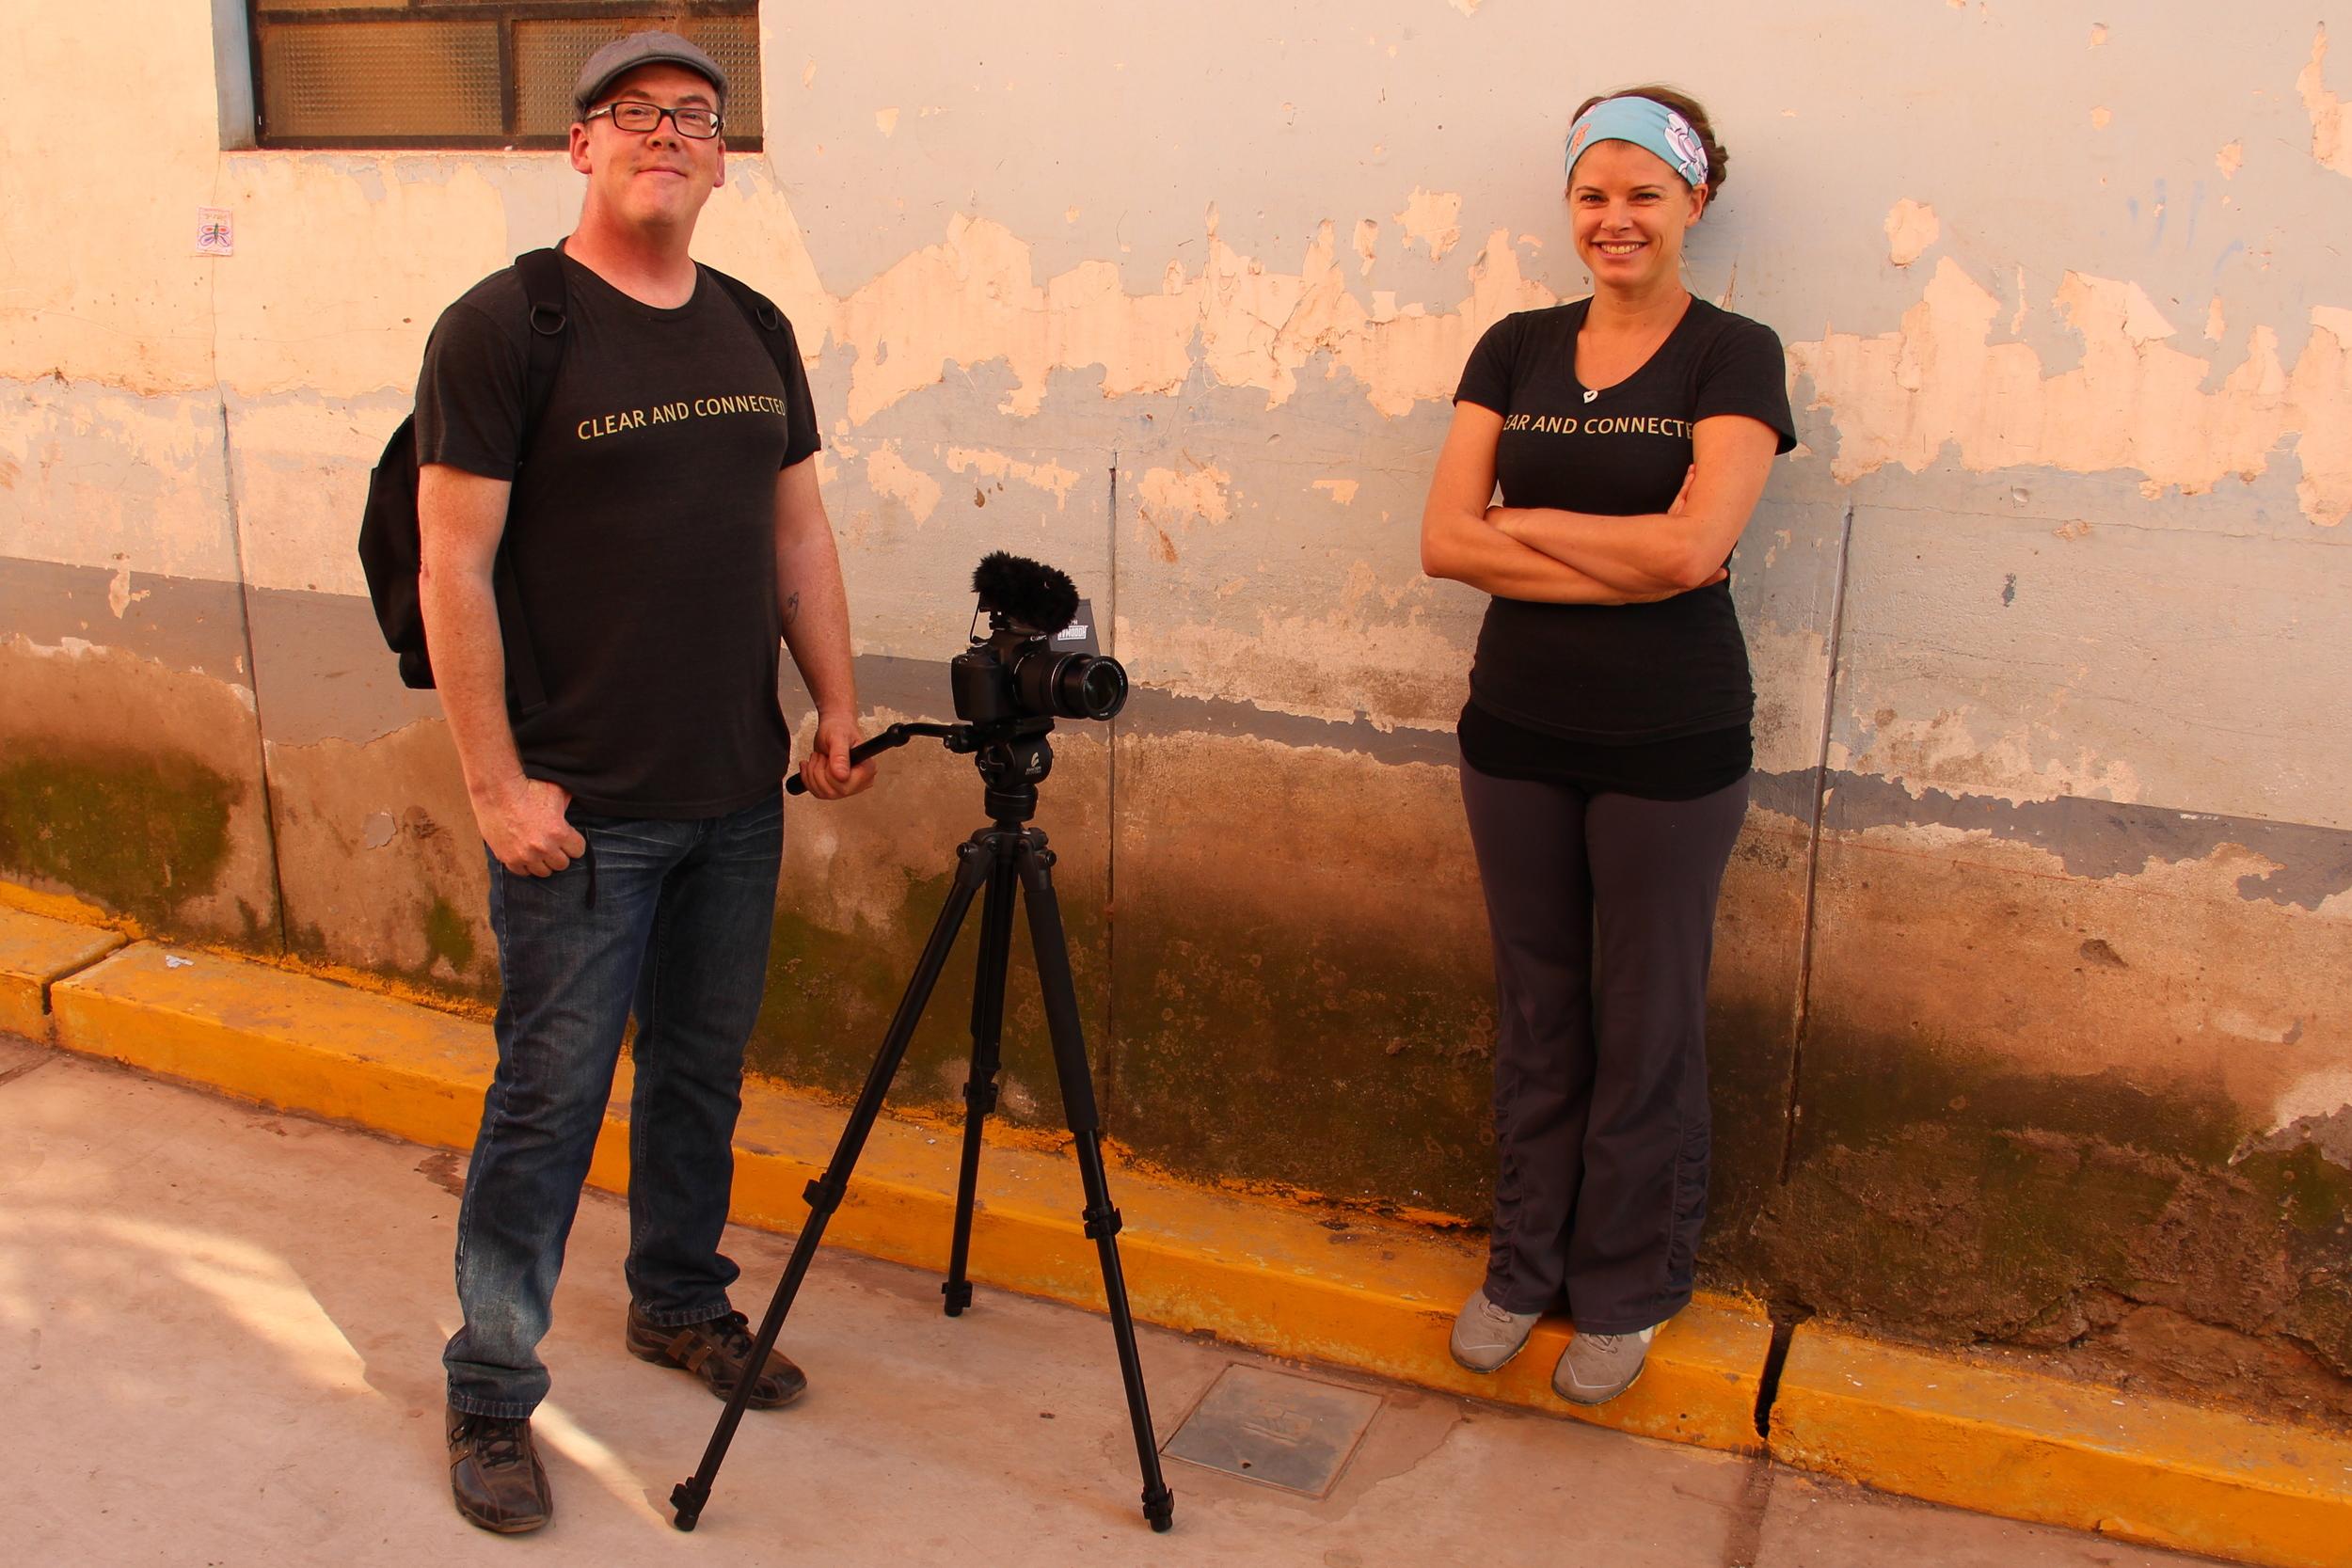 Produced, Directed, & Writtenby  Dr. Rhea Zimmerman Komarek  Director of Photography & Editor, Gregg Marks